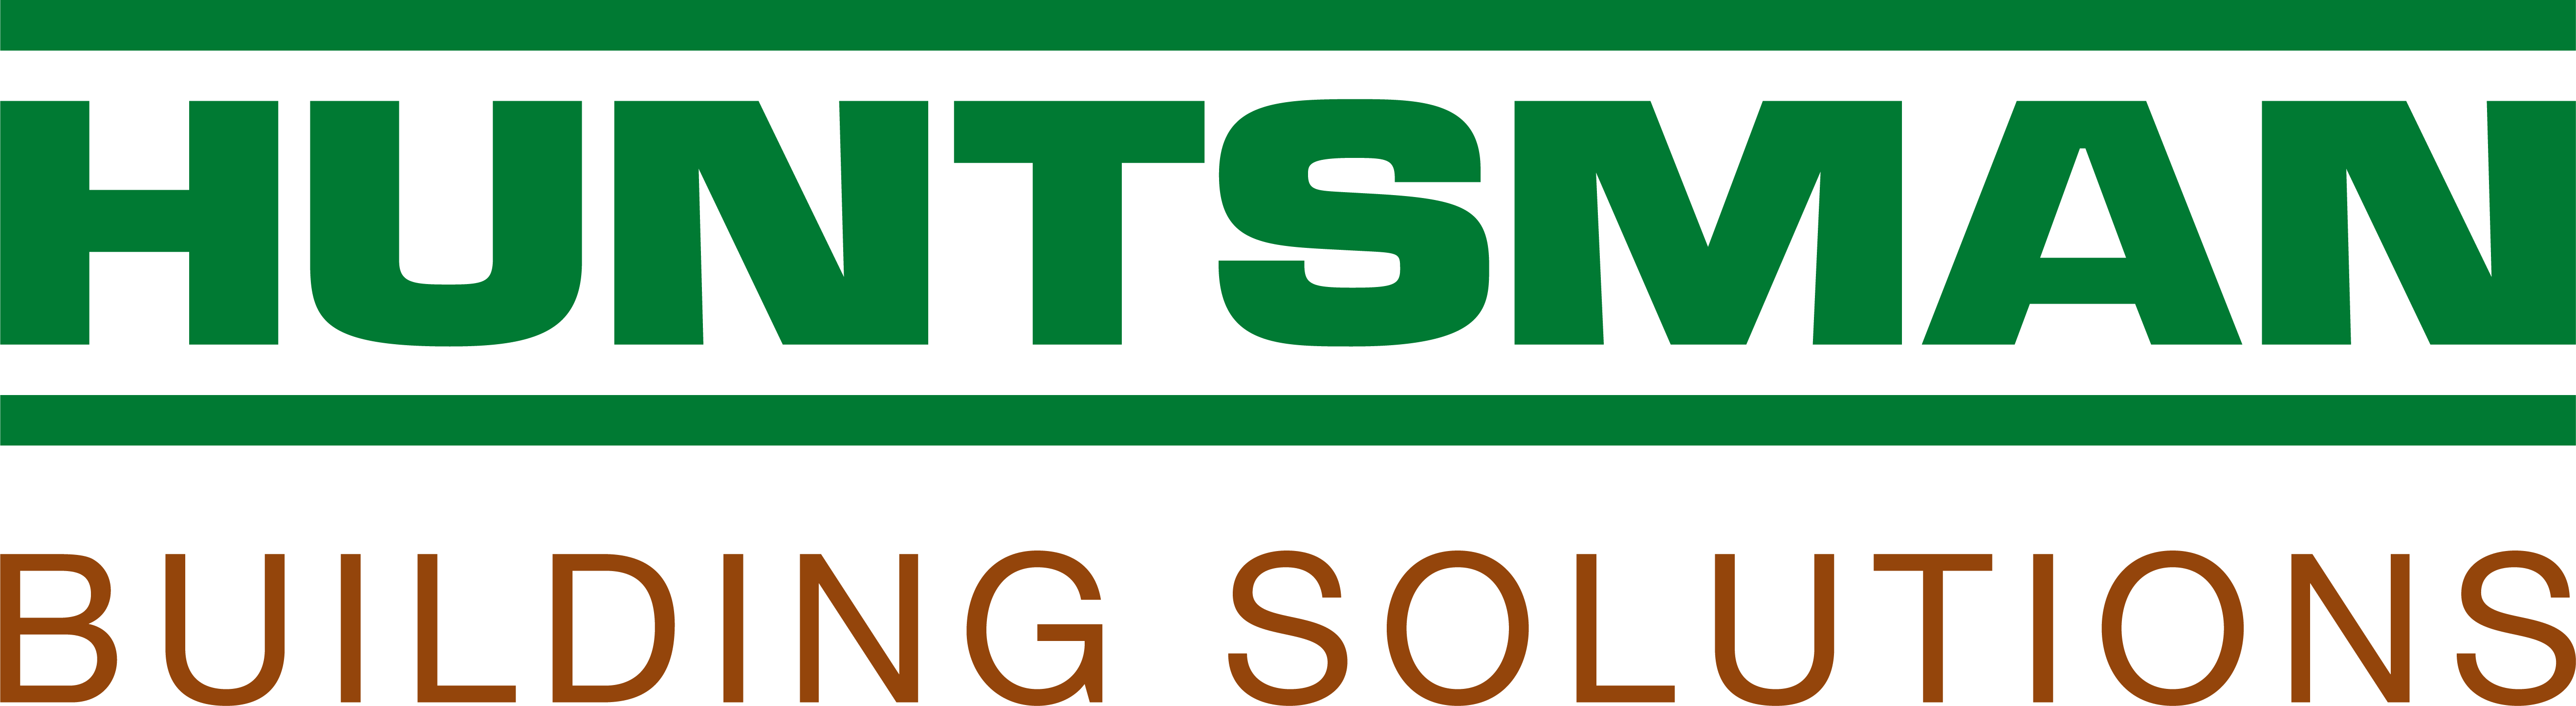 huntsman insulation building solution logo